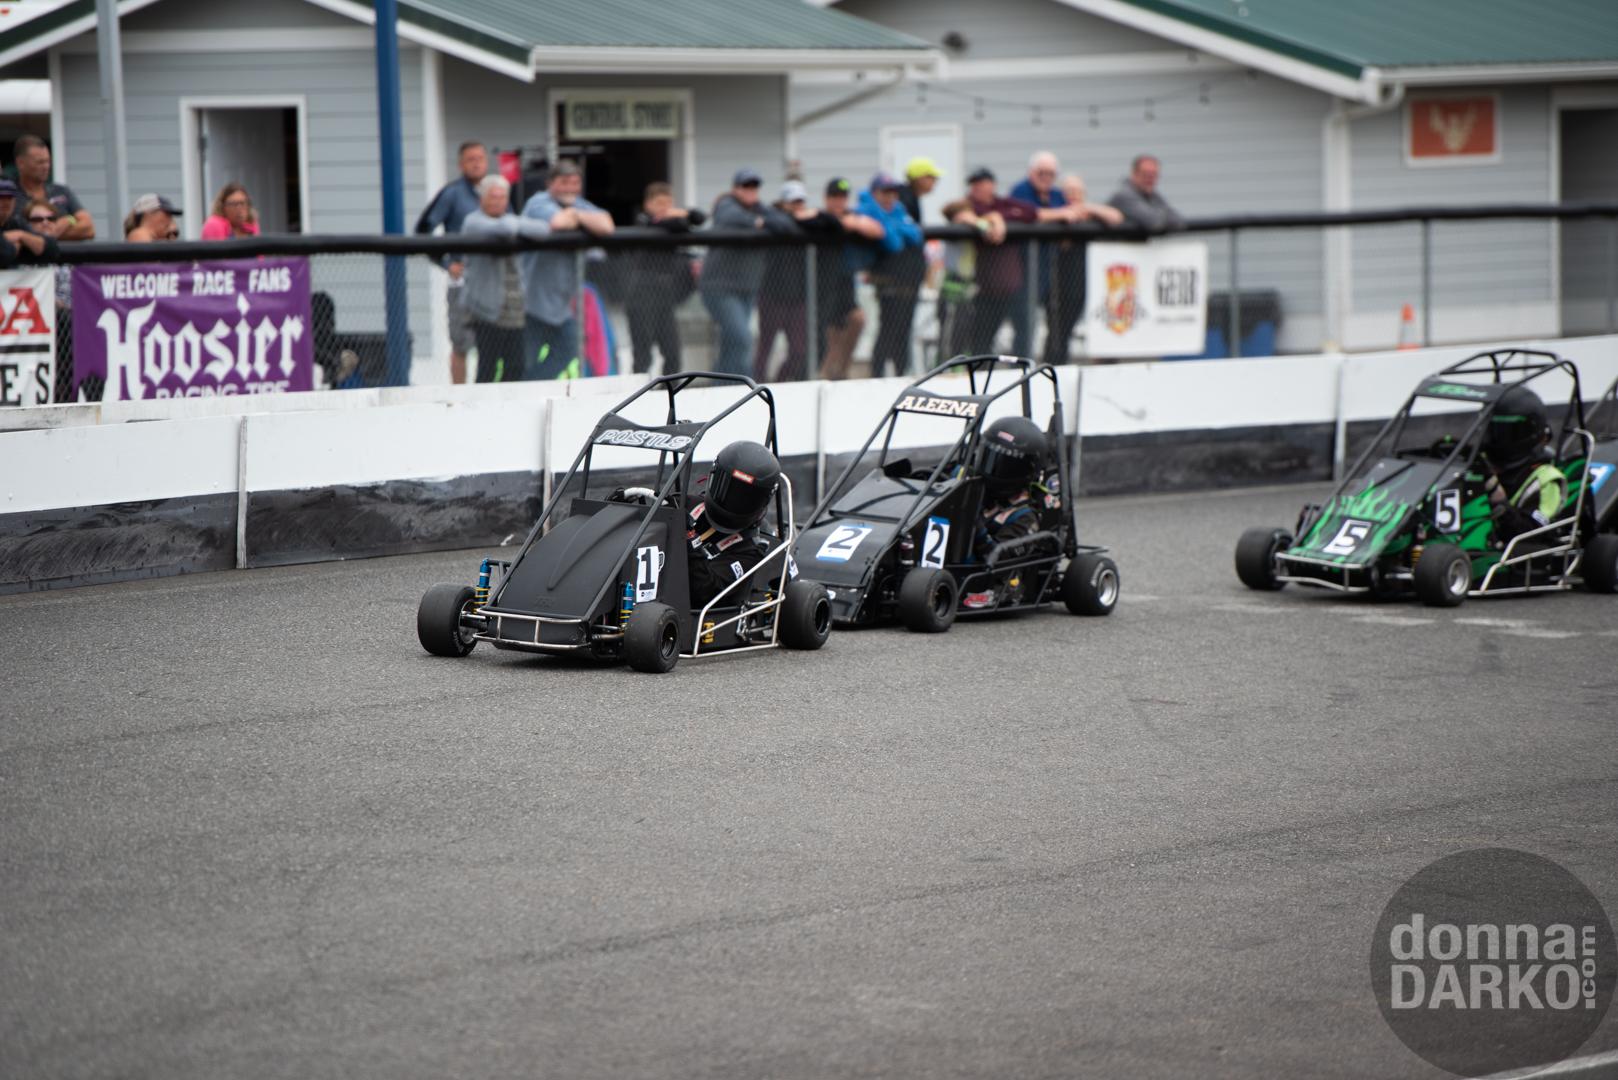 QWMA (Racing) 8-11-2019 DSC_6613.jpg